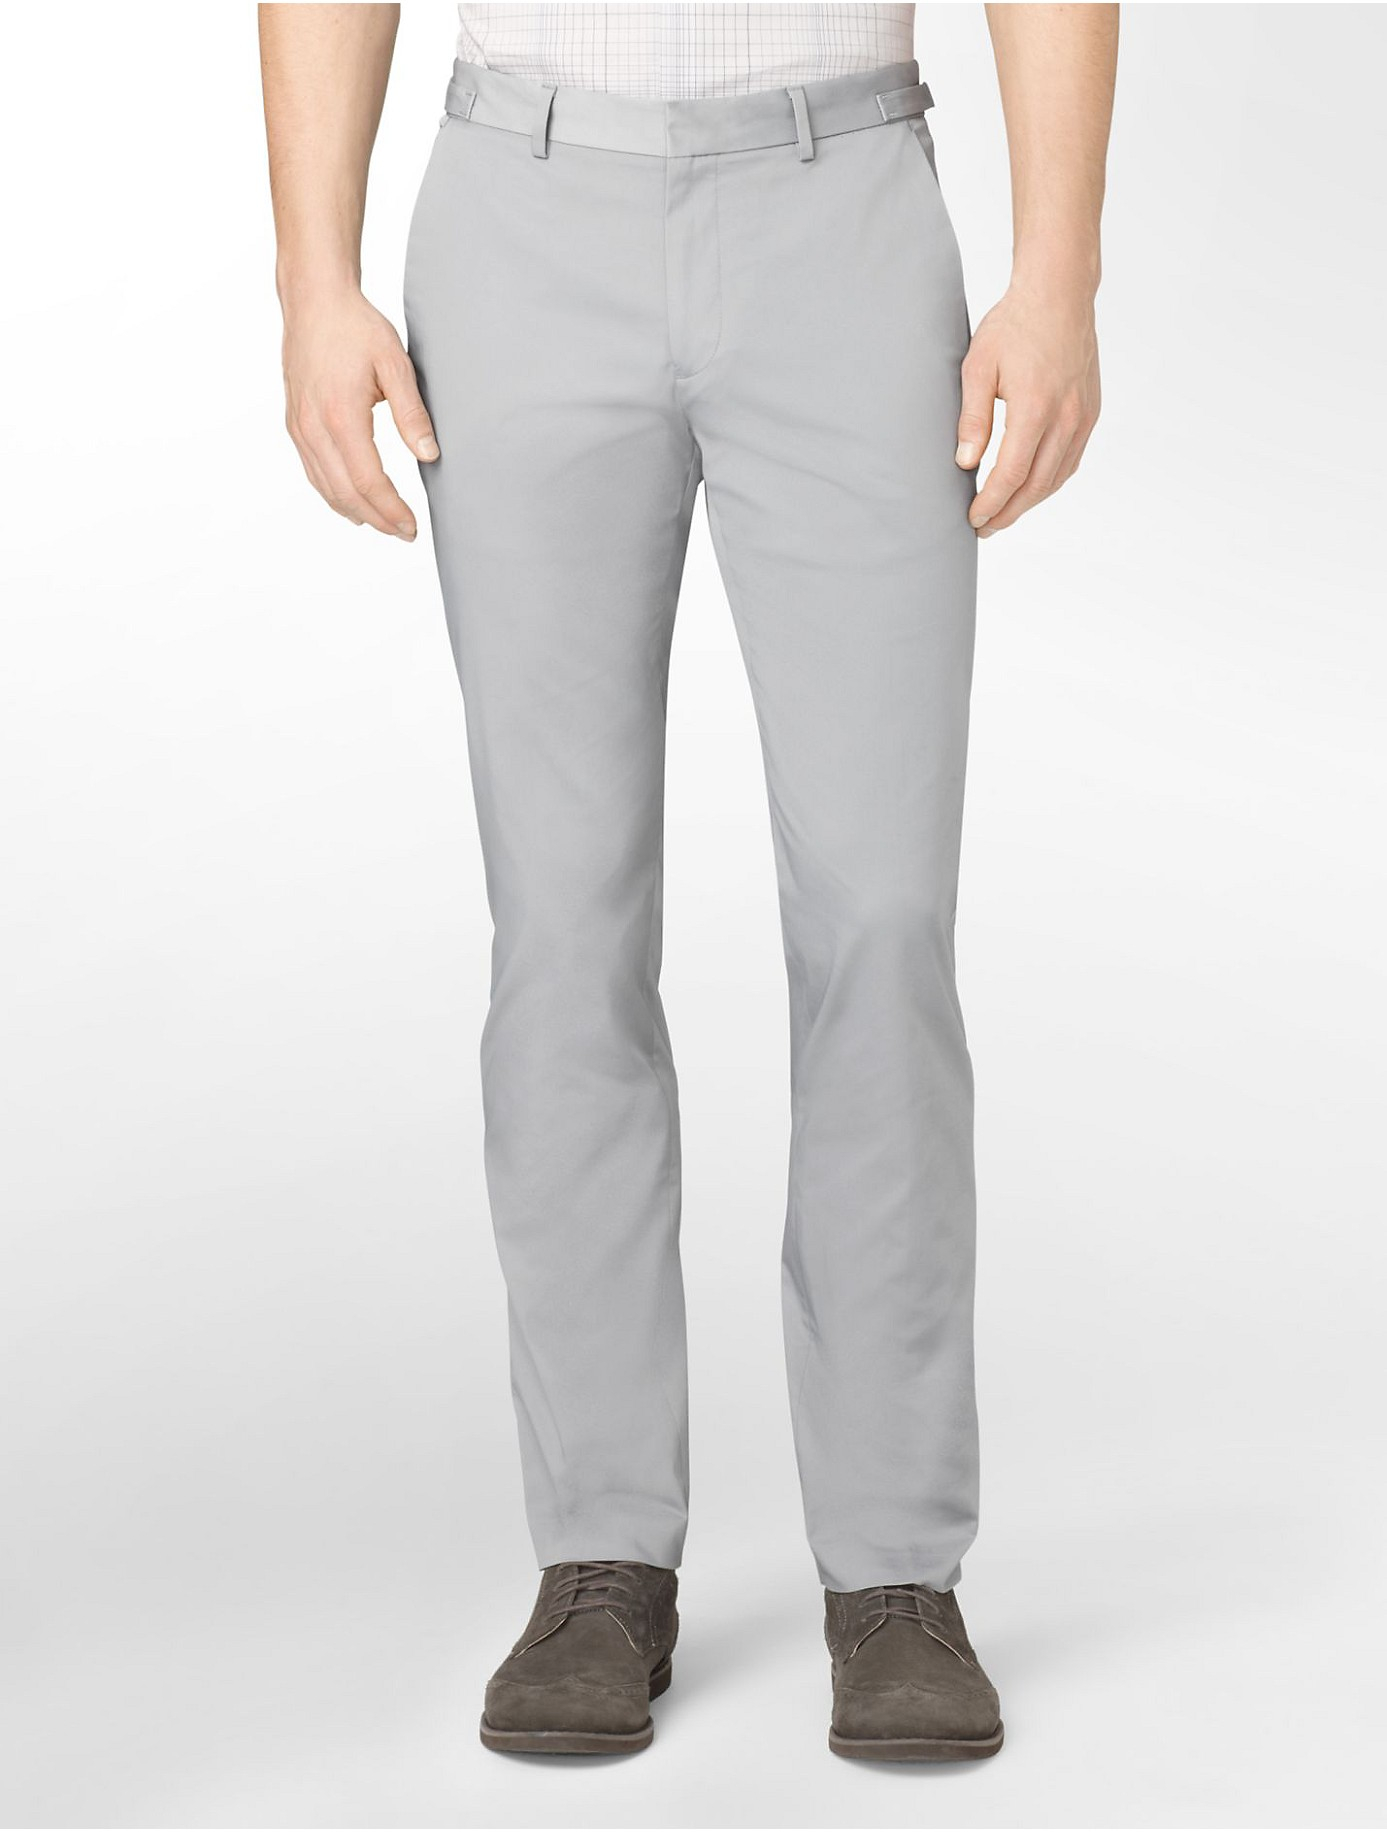 X long dress pants normal fit